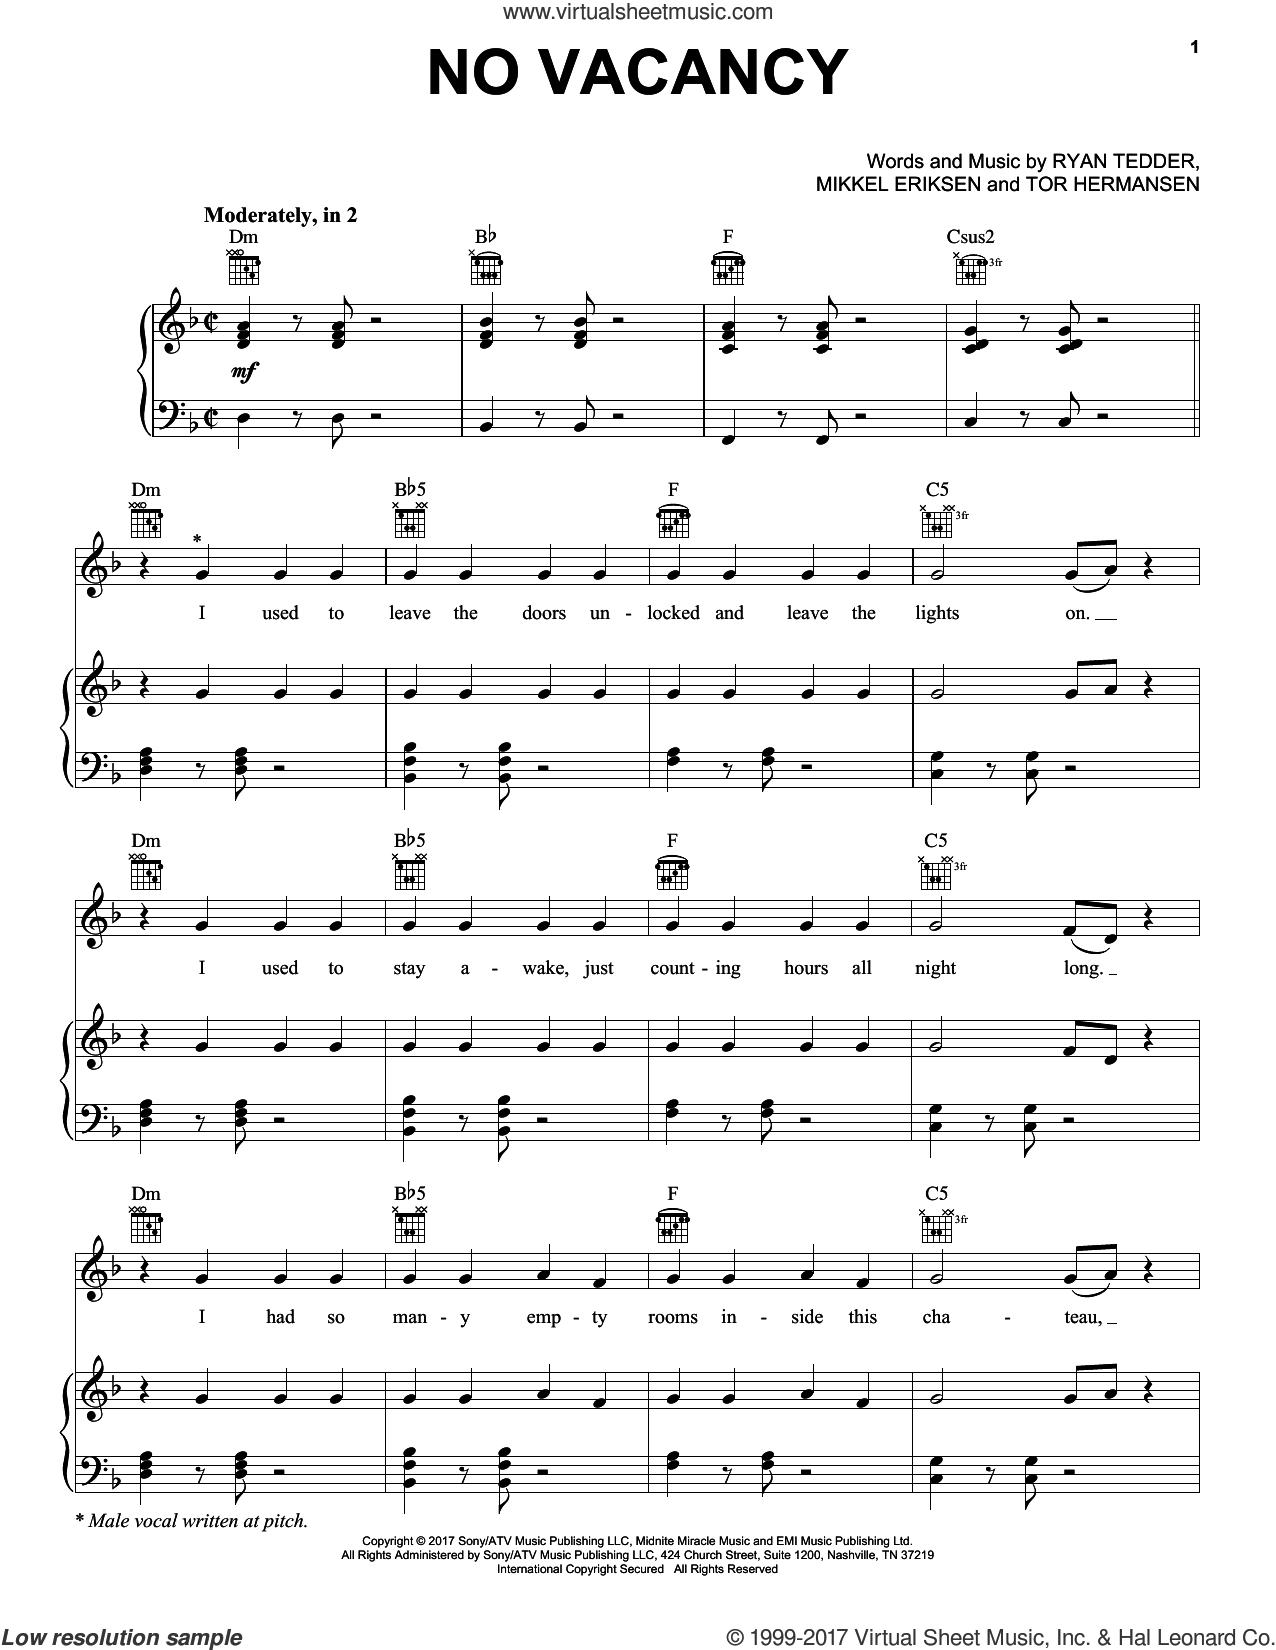 No Vacancy sheet music for voice, piano or guitar by OneRepublic, Mikkel Eriksen, Ryan Tedder and Tor Erik Hermansen, intermediate skill level